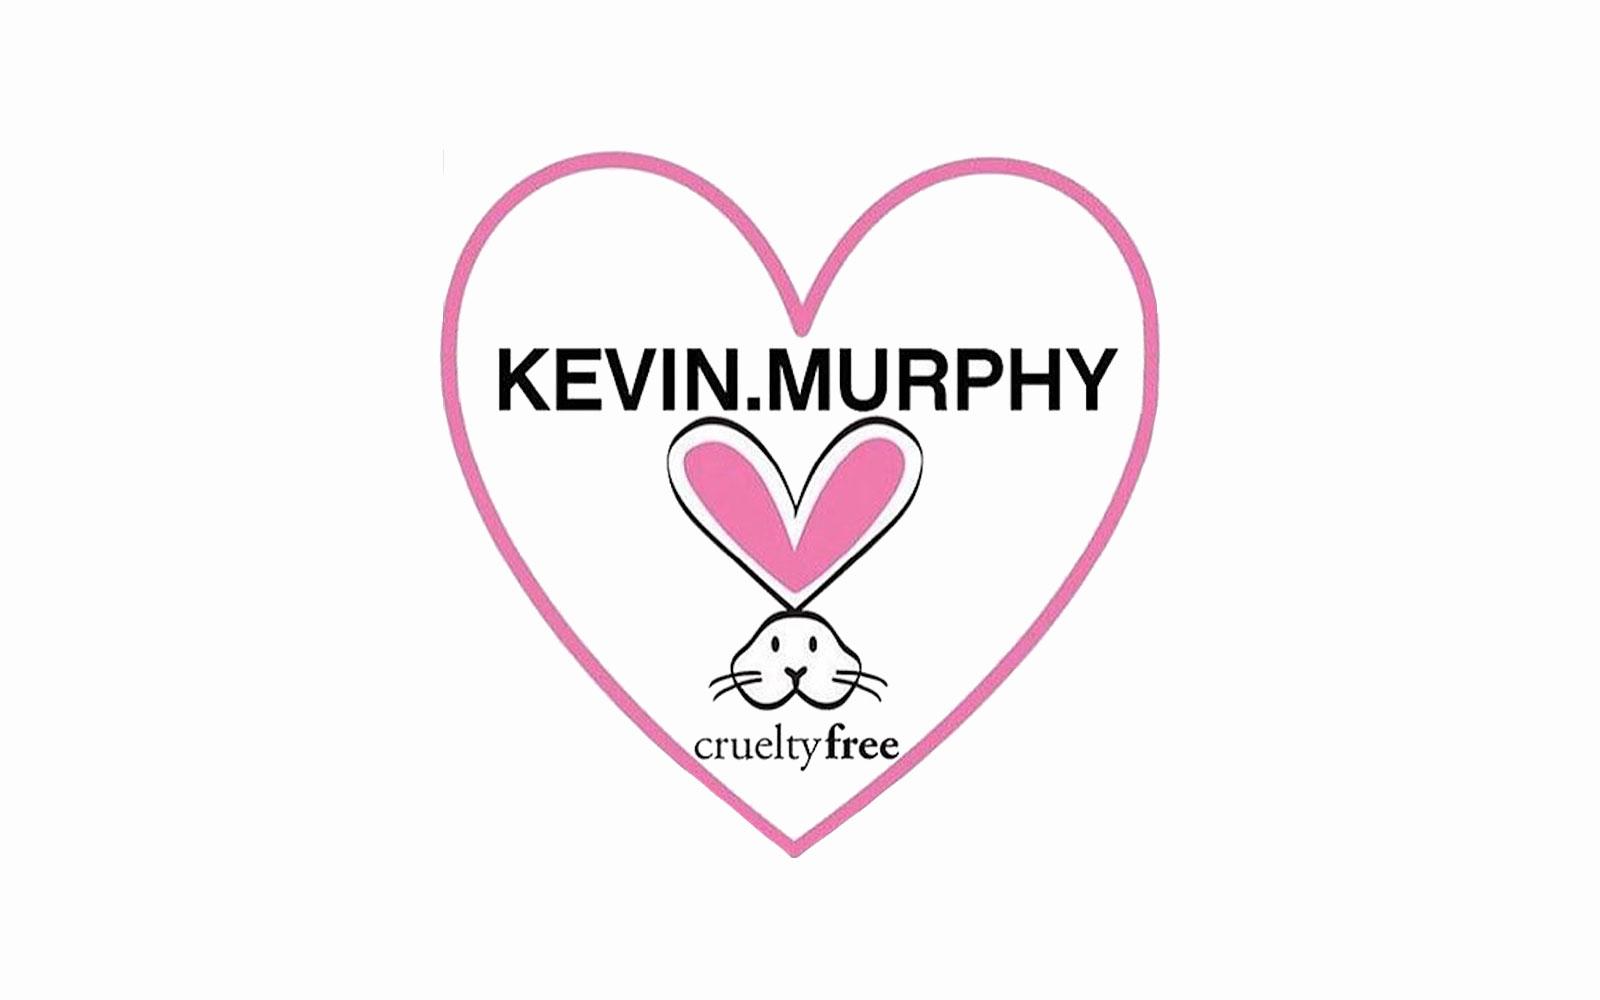 Kevin Murphy Cruelty Free